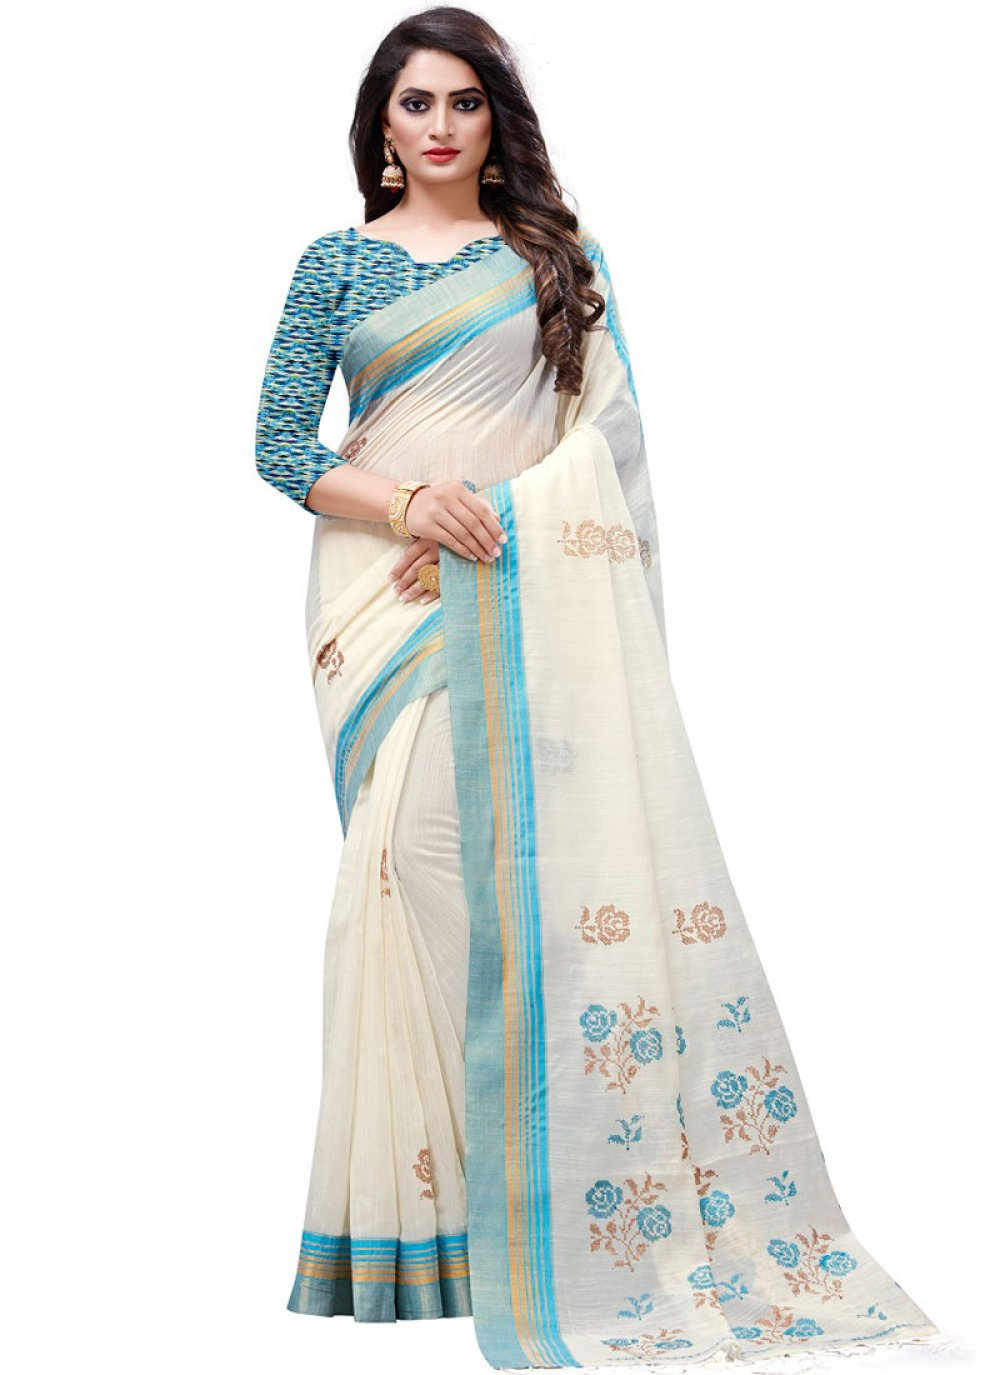 Designer Traditional Saree Embroidered Cotton in White